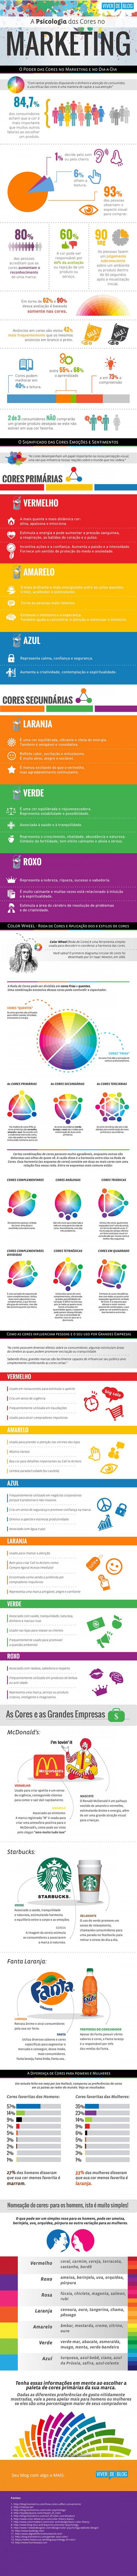 Infografico_Psicologia_Cores_600.jpg